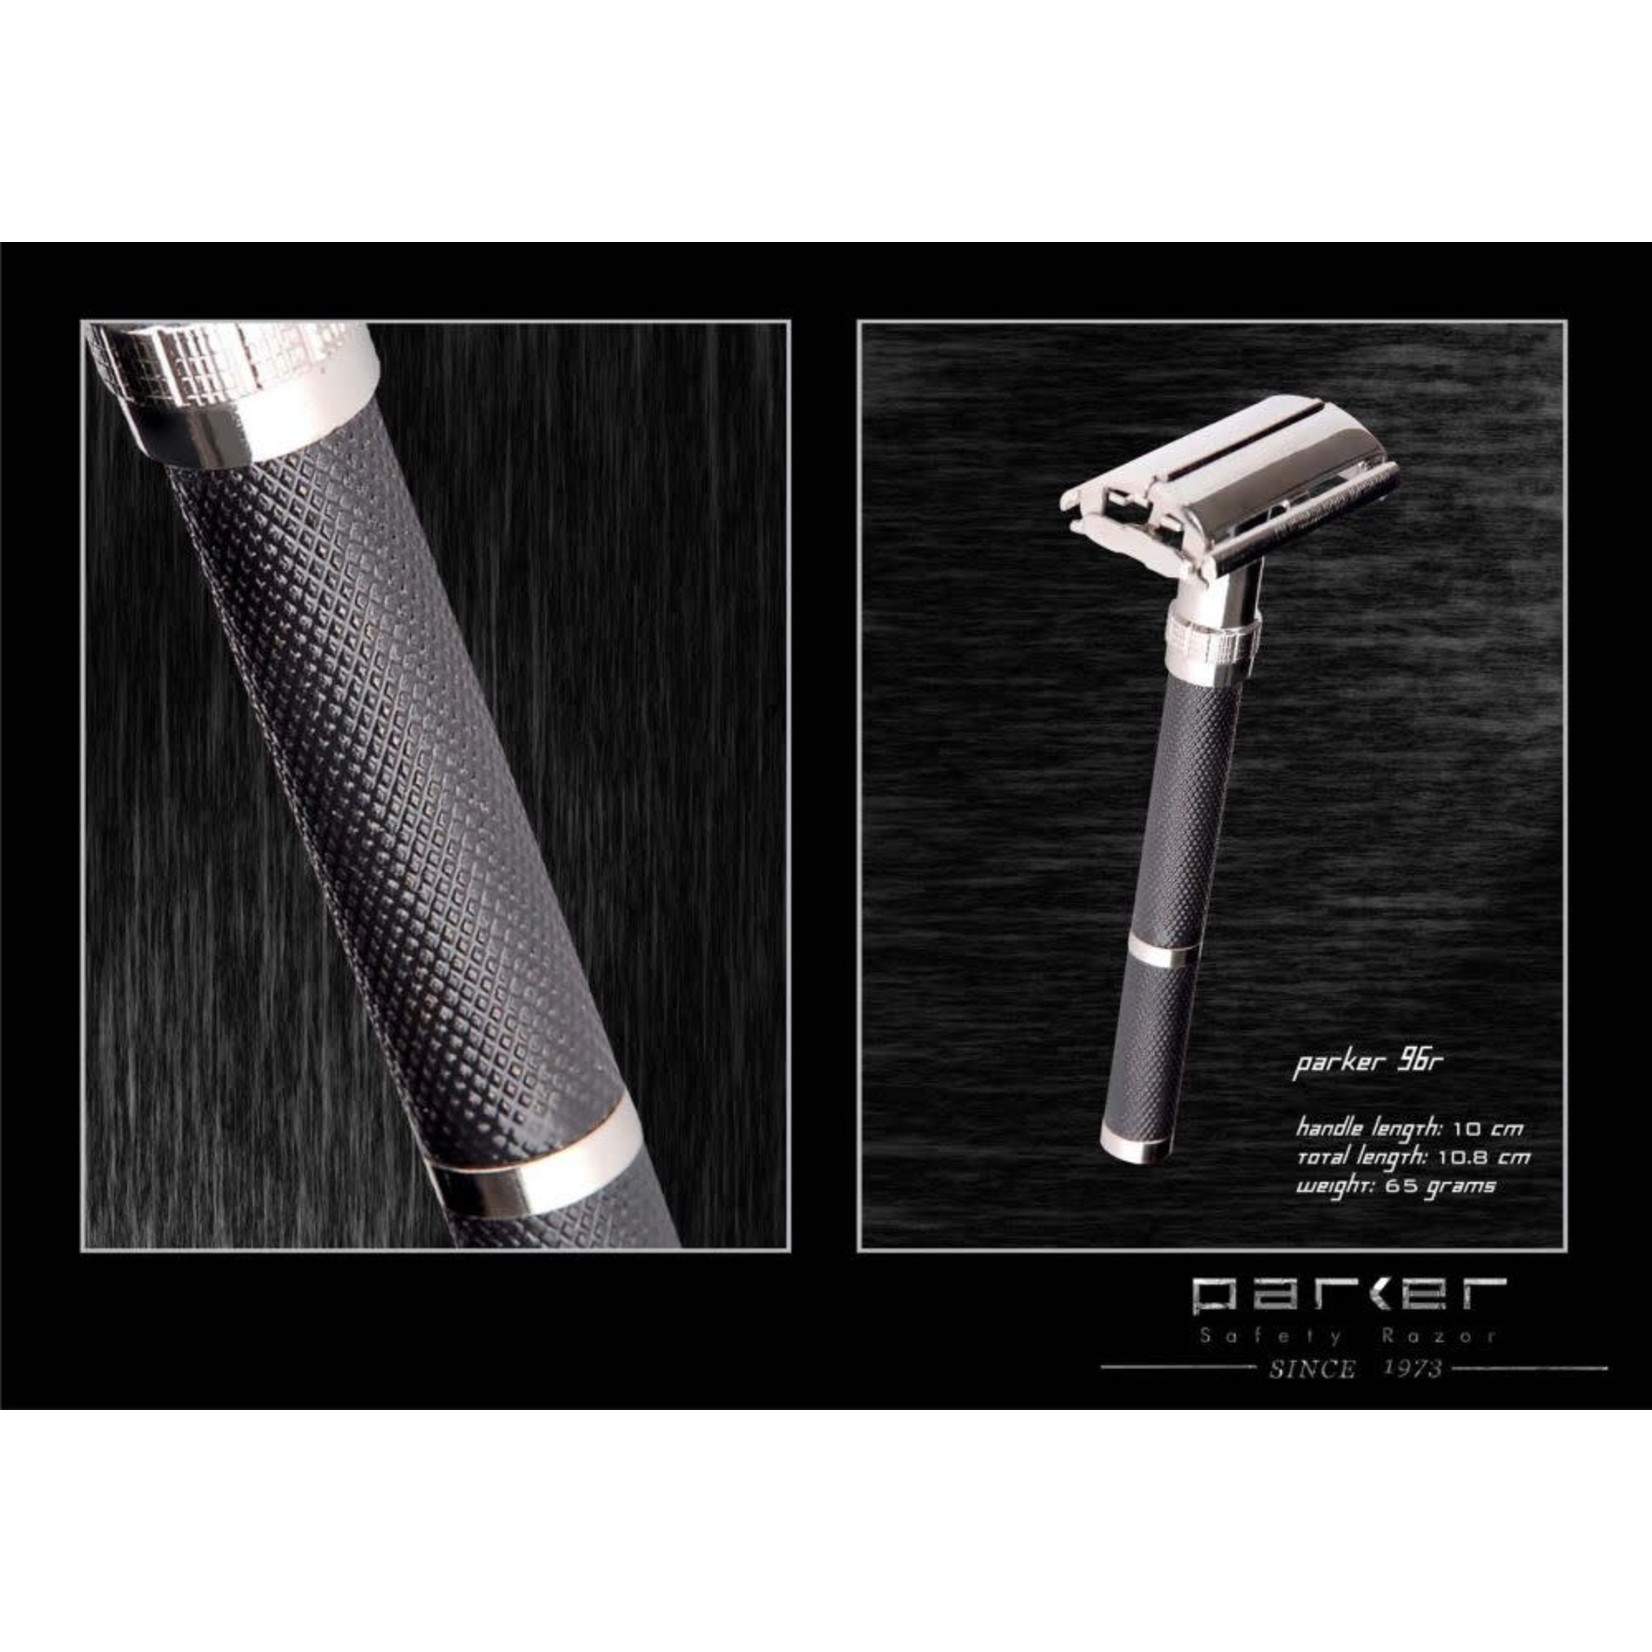 Parker Razor Parker Safety Razor 96R